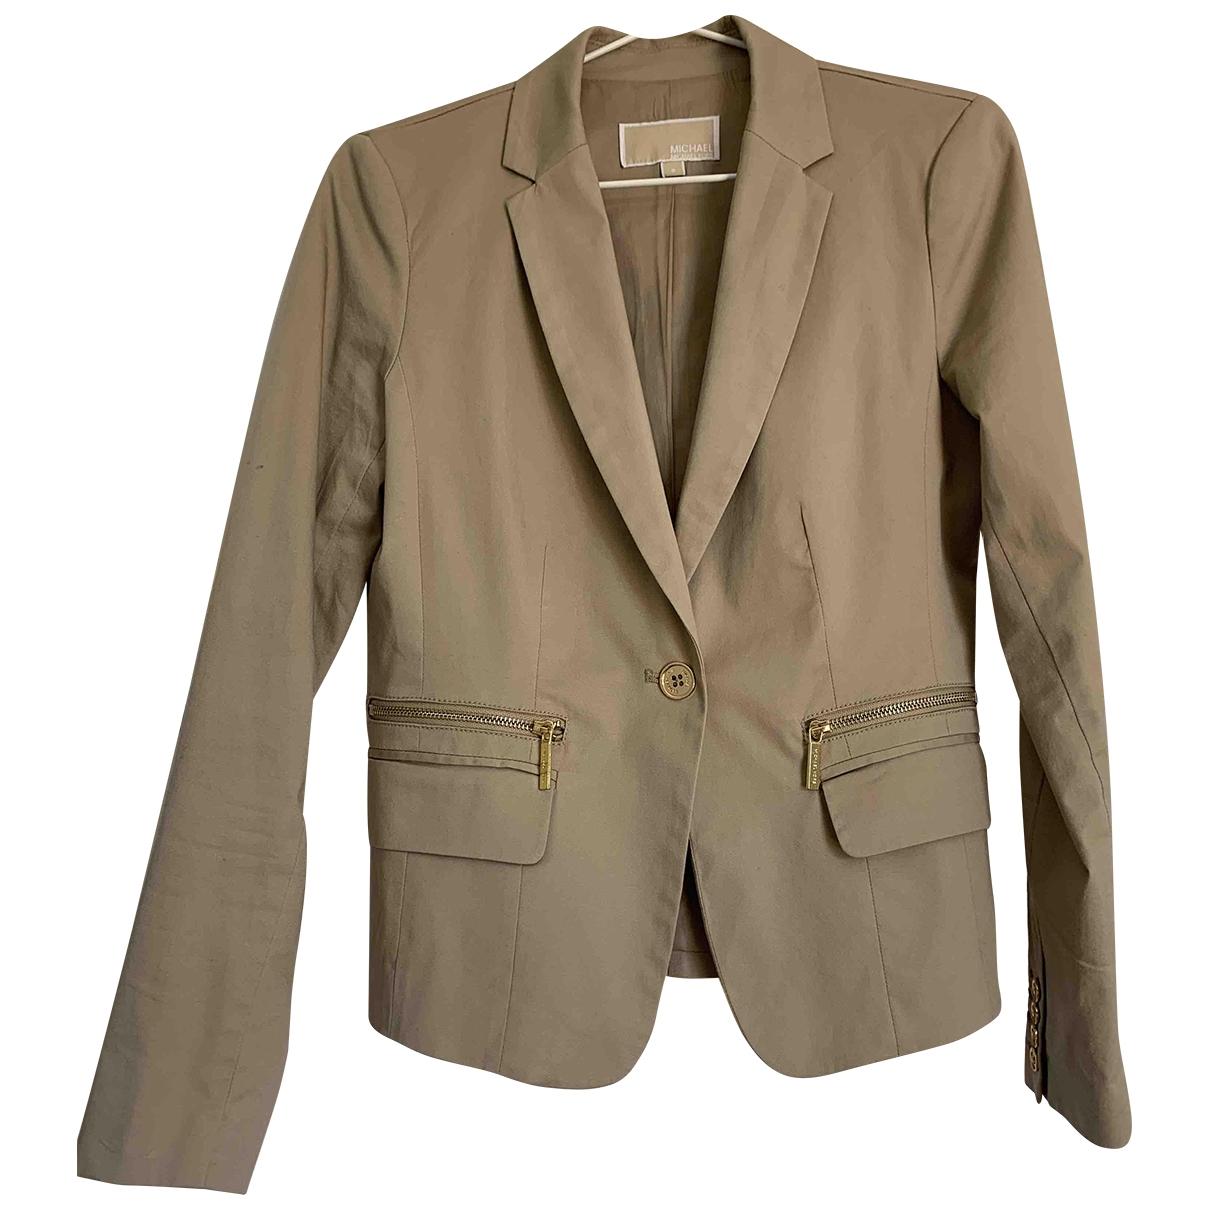 Michael Kors \N Beige Cotton jacket for Women 40 FR